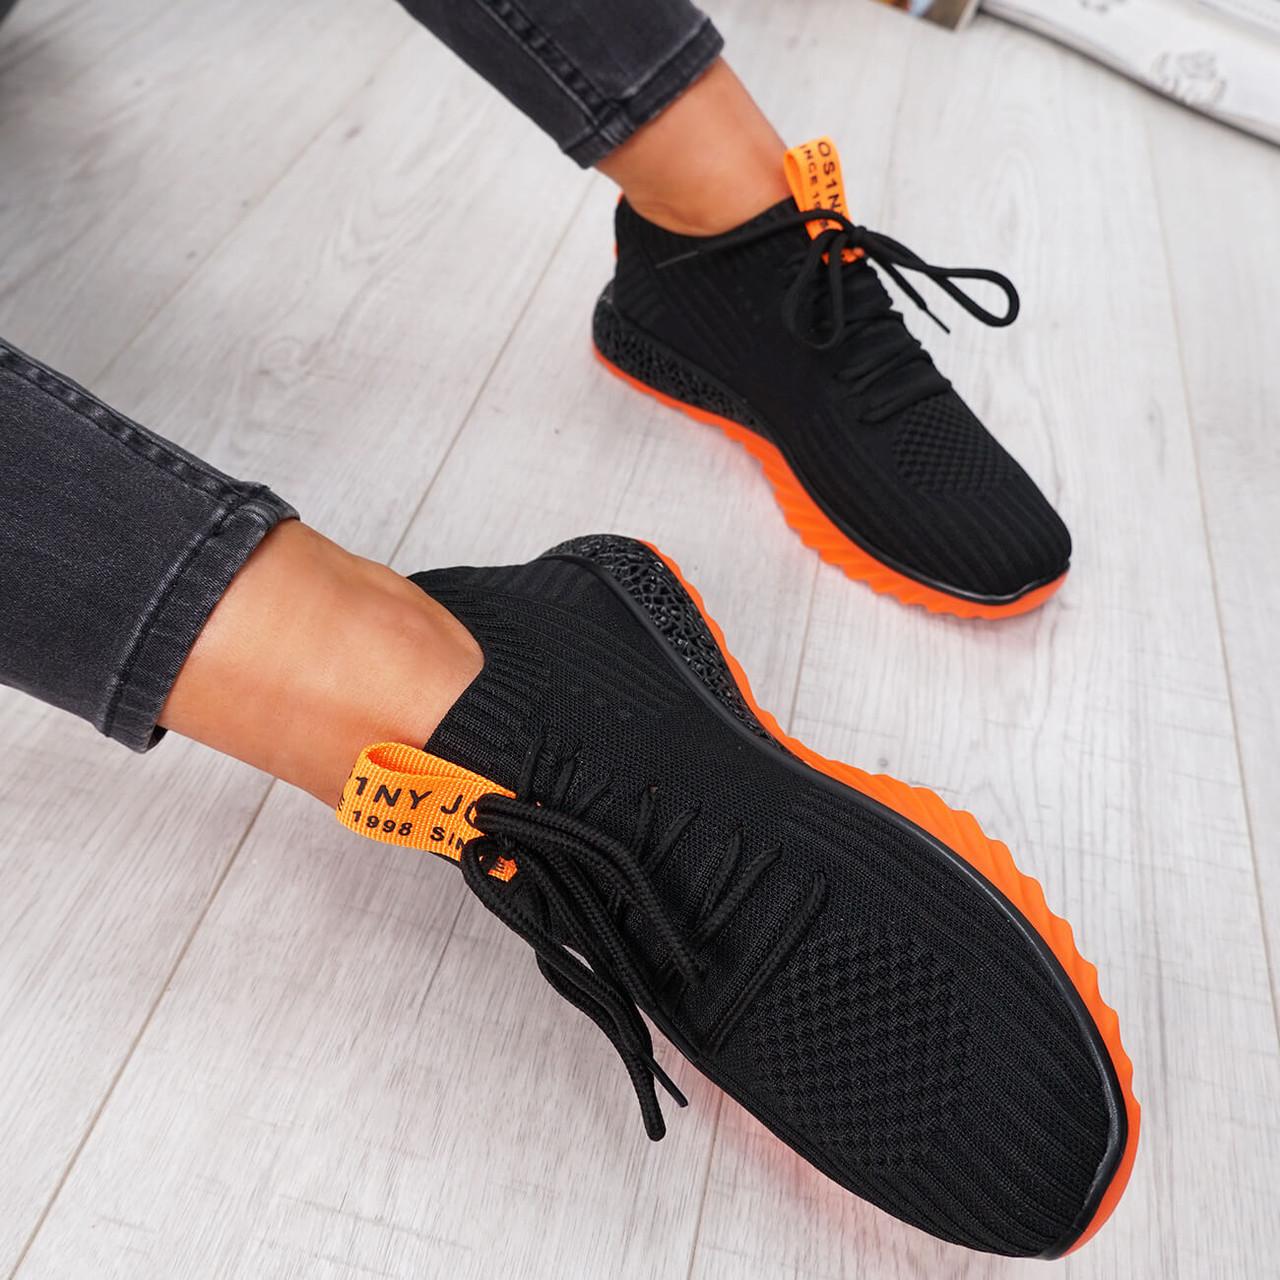 Rynna Black Running Trainers